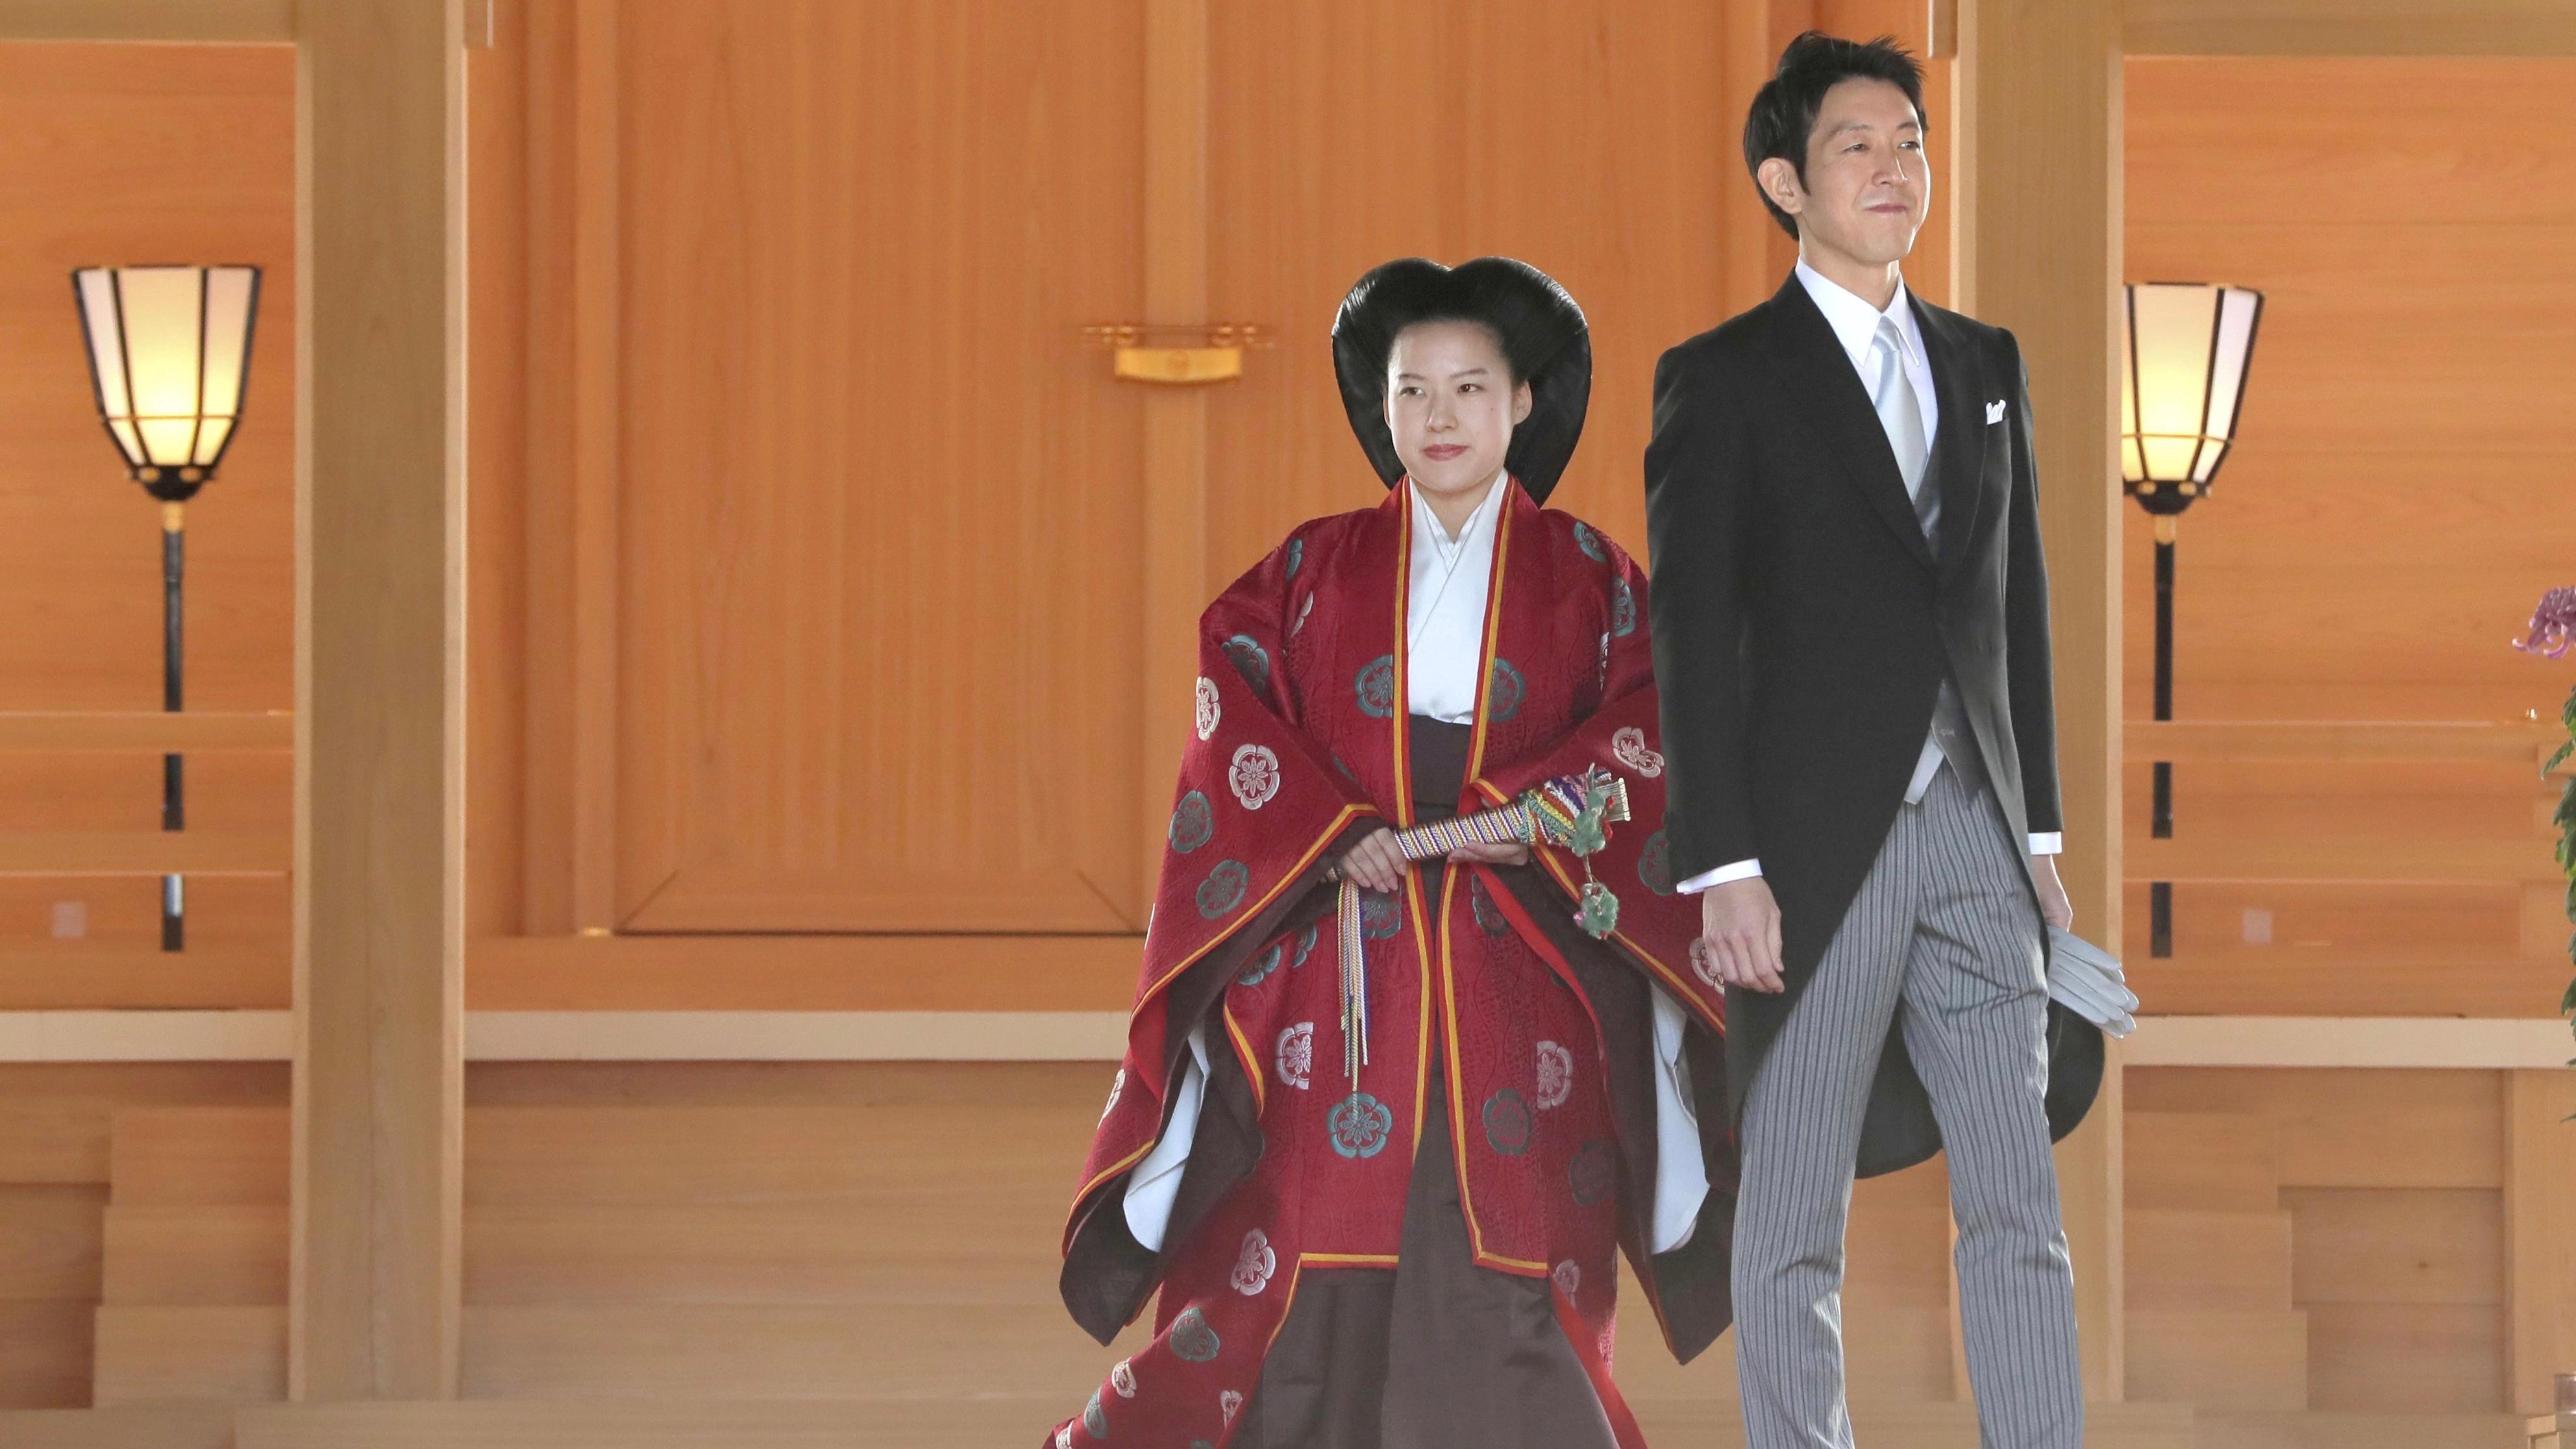 Princess Ayako and her husband Kei Moriya at the Meiji Shrine in Tokyo, Japan.